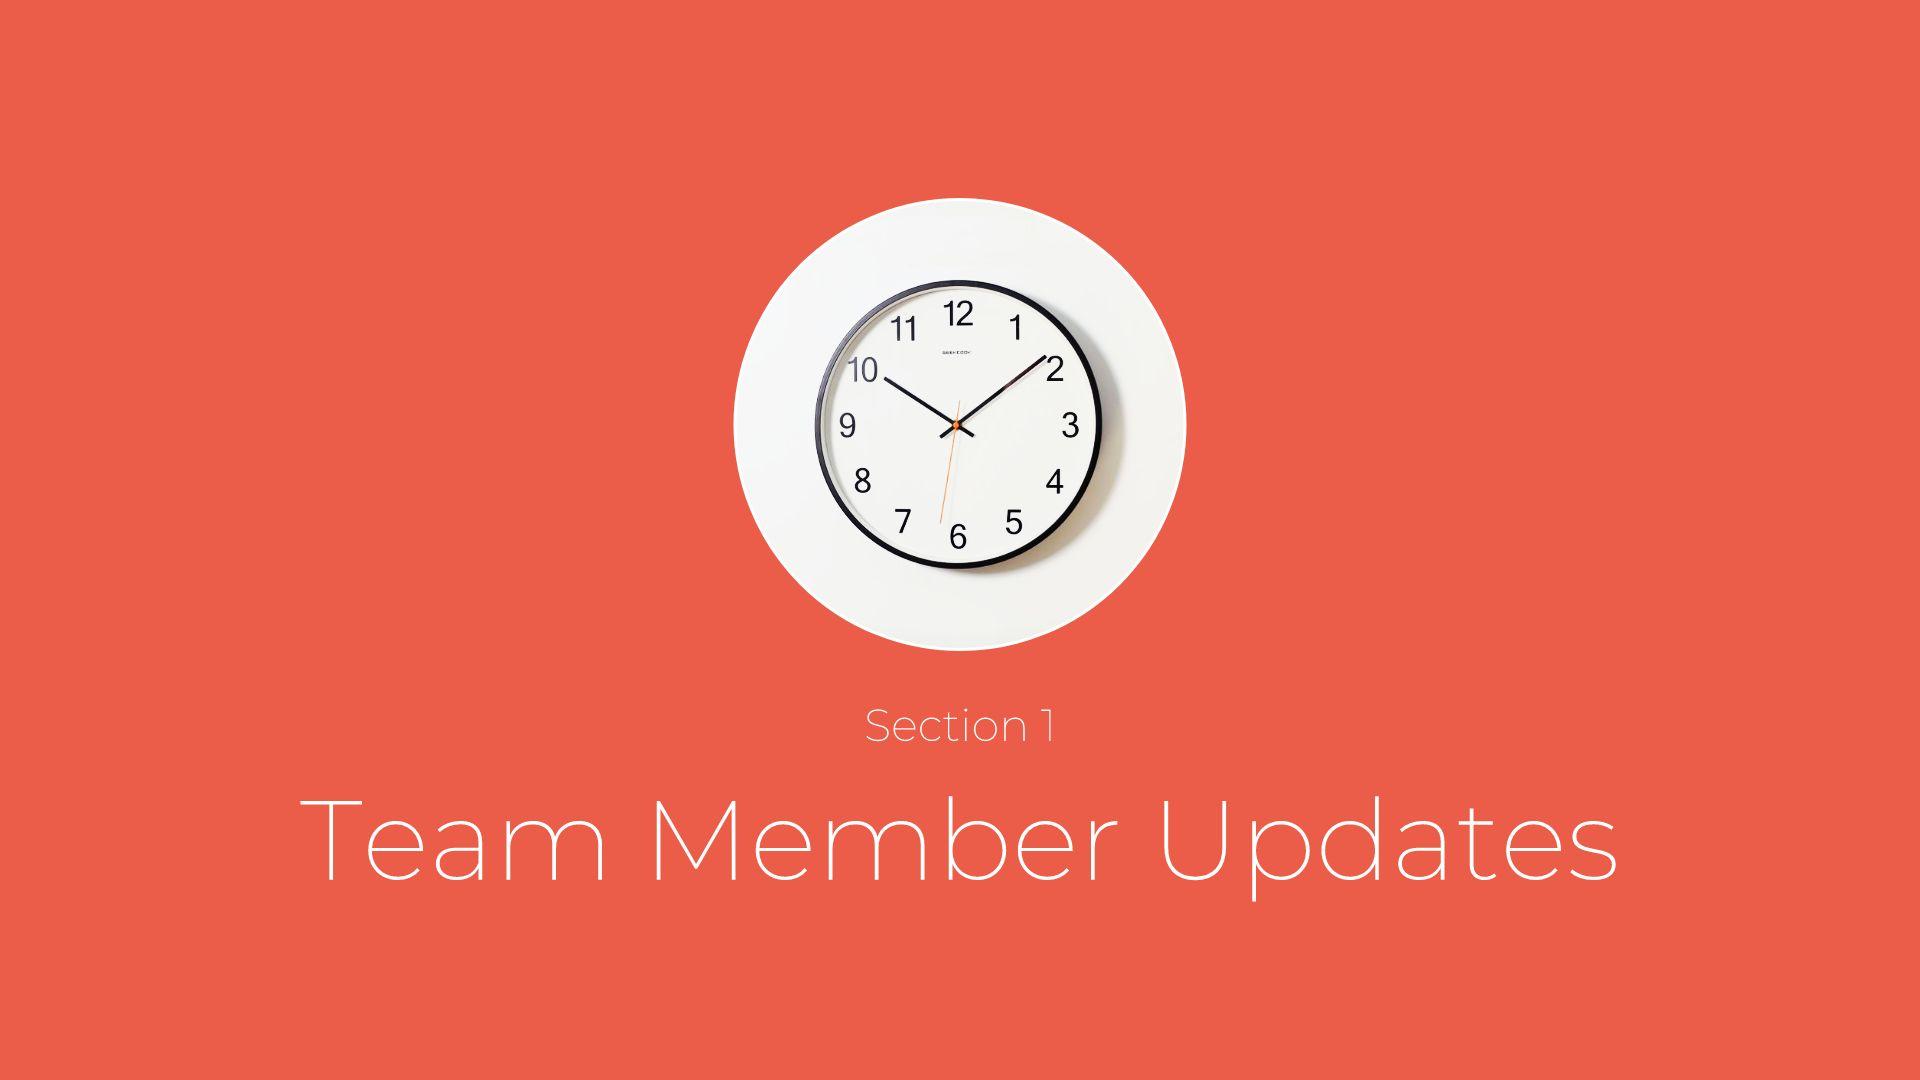 Team Member Update